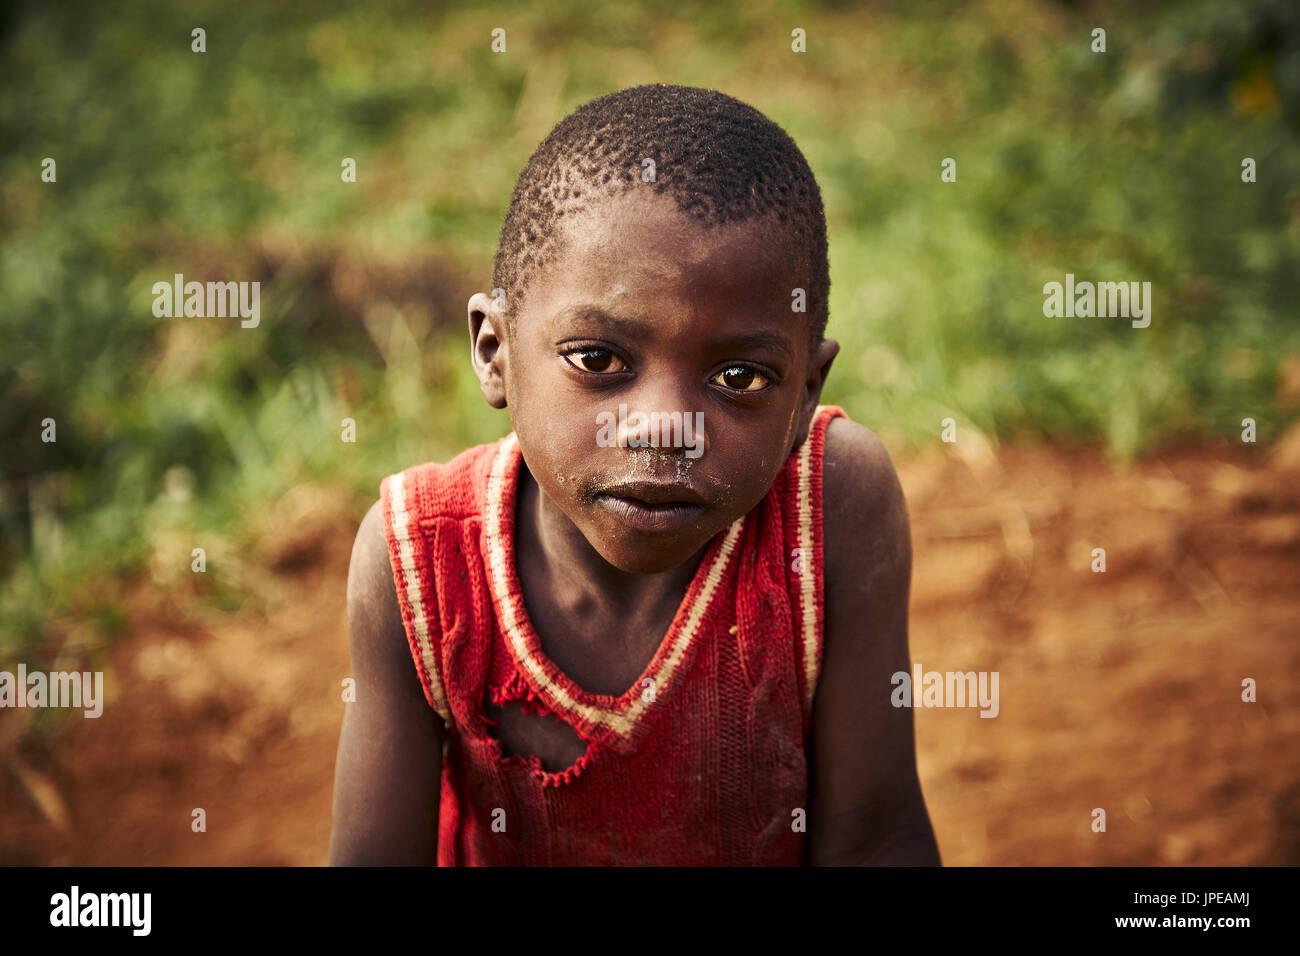 Poor kid in a tribal village near Bwindi Impenetrable Forest,Bwindi Impenetrable Forest, Bwindi National Park, Kanungu District, Kigezi sub-region, Uganda, Eastern Equatorial Africa, Africa - Stock Image